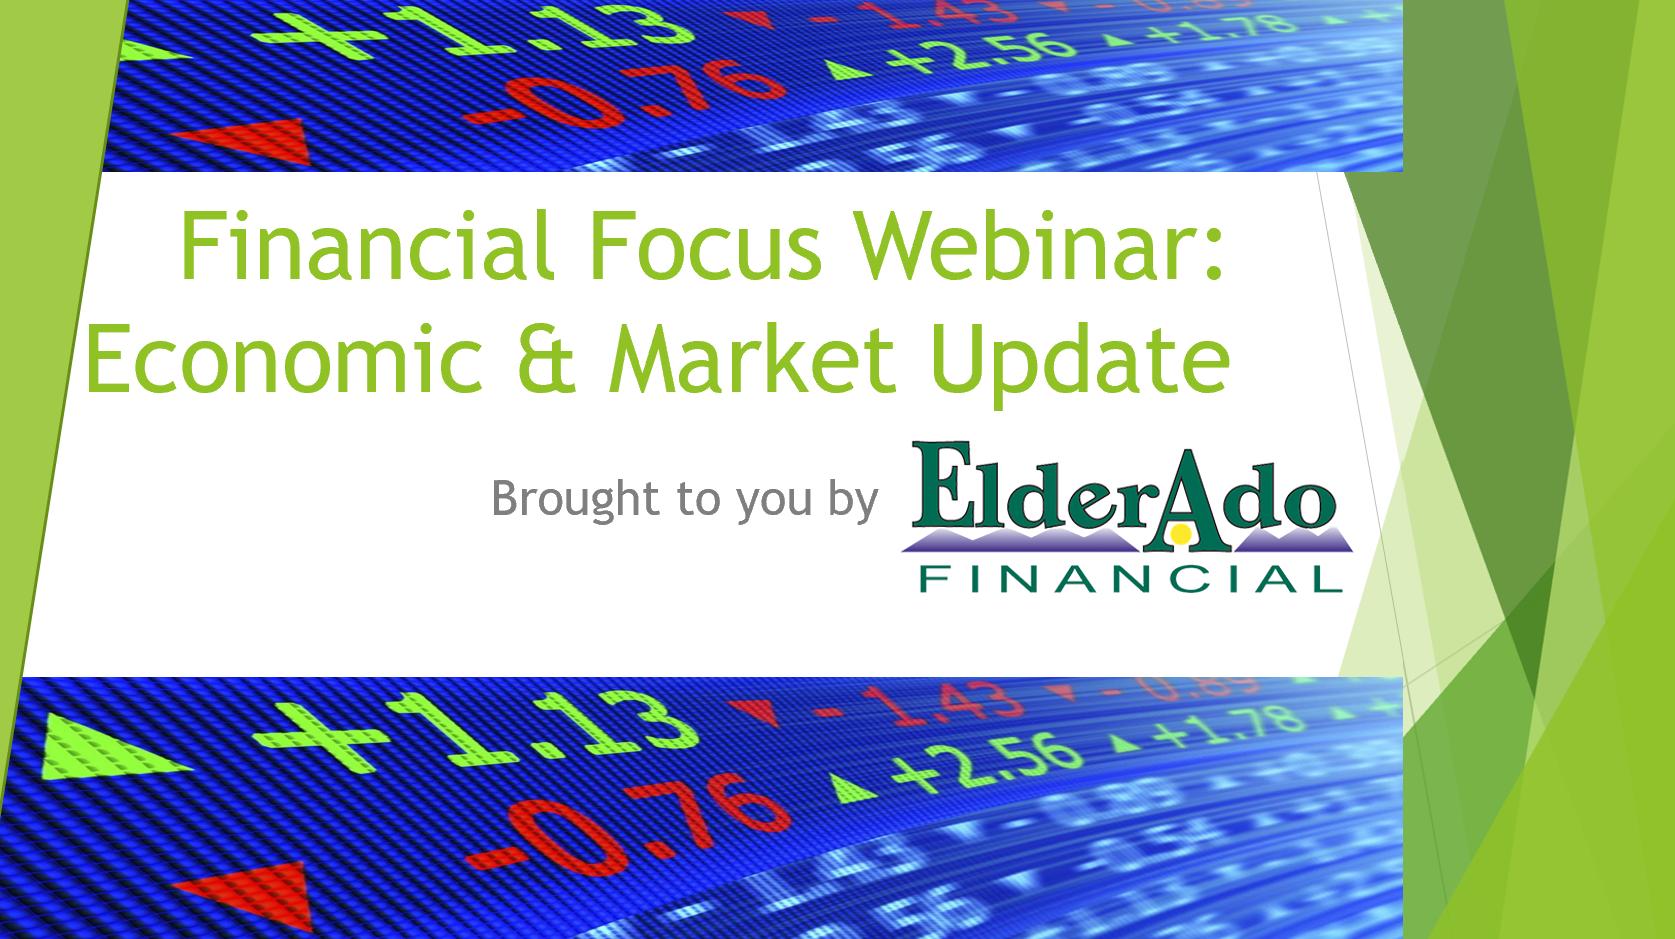 Financial Focus Webinar: Economic & Market Update